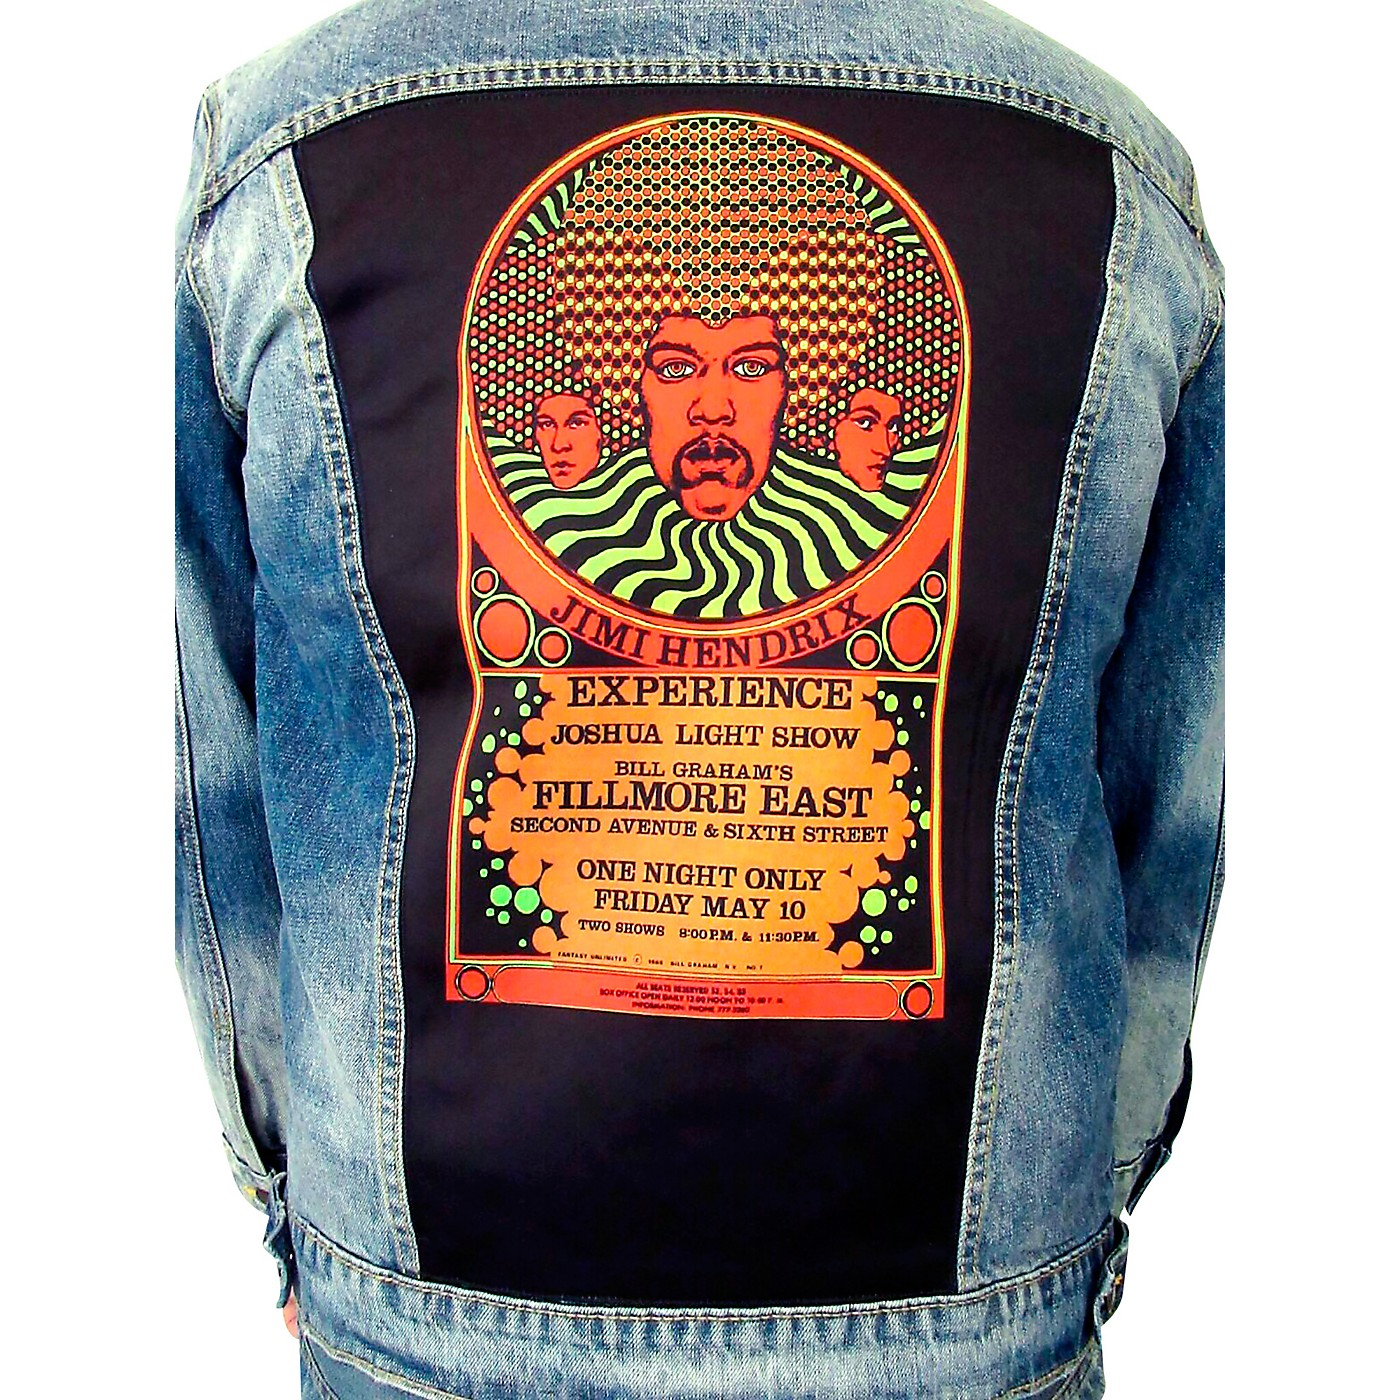 Dragonfly Clothing Jimi Hendrix Experience 3 Faces - Psychedelic Denim Jacket thumbnail